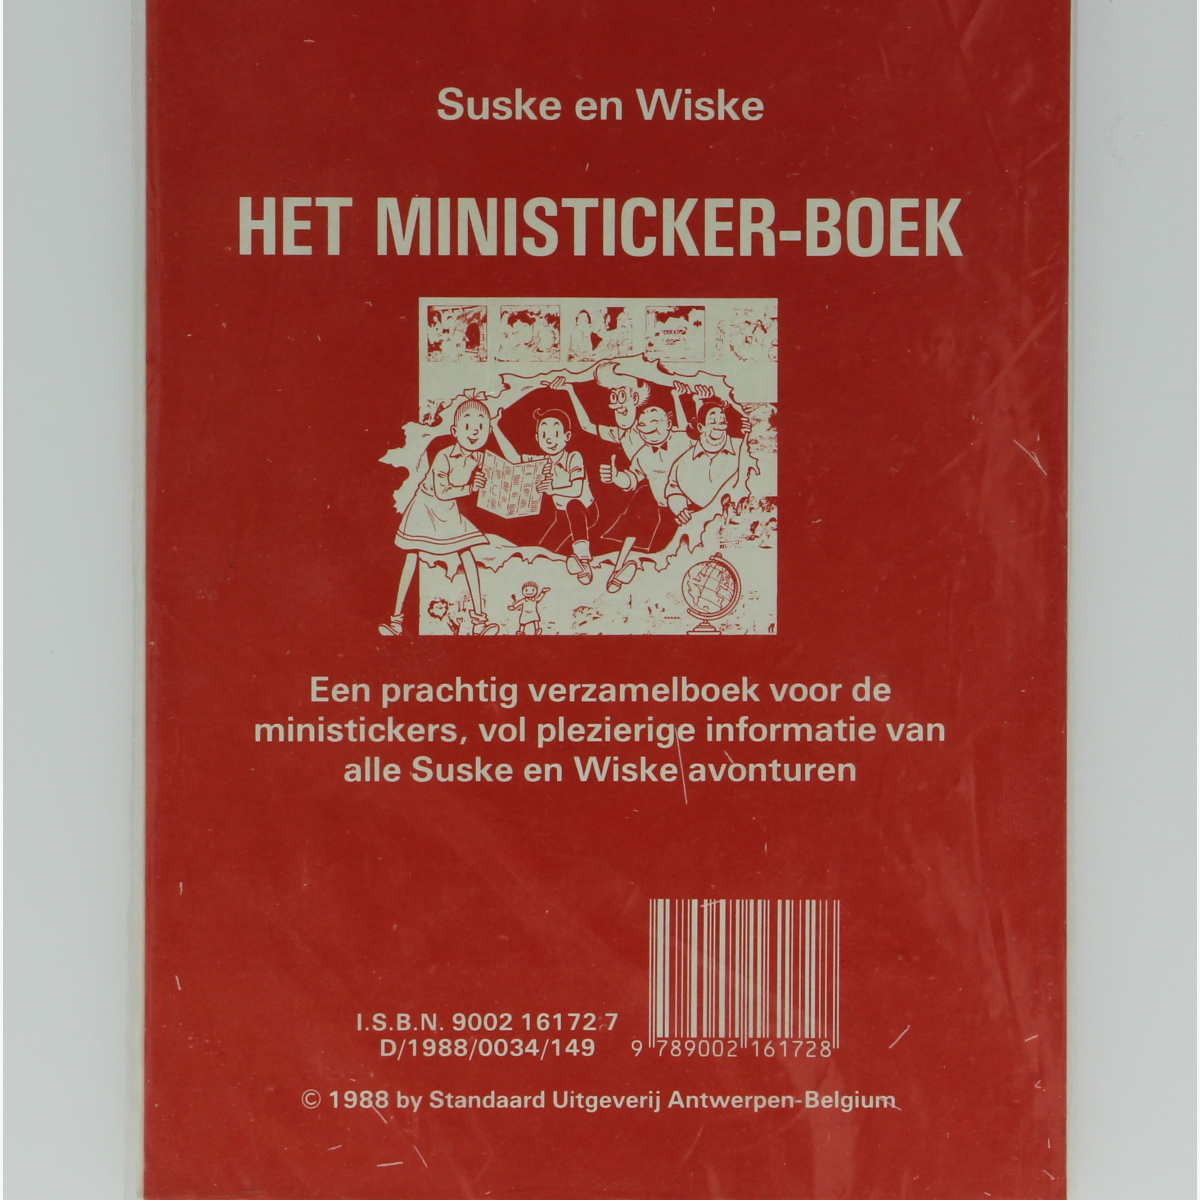 Afbeeldingen van Suske en Wiske mini stickers 1988